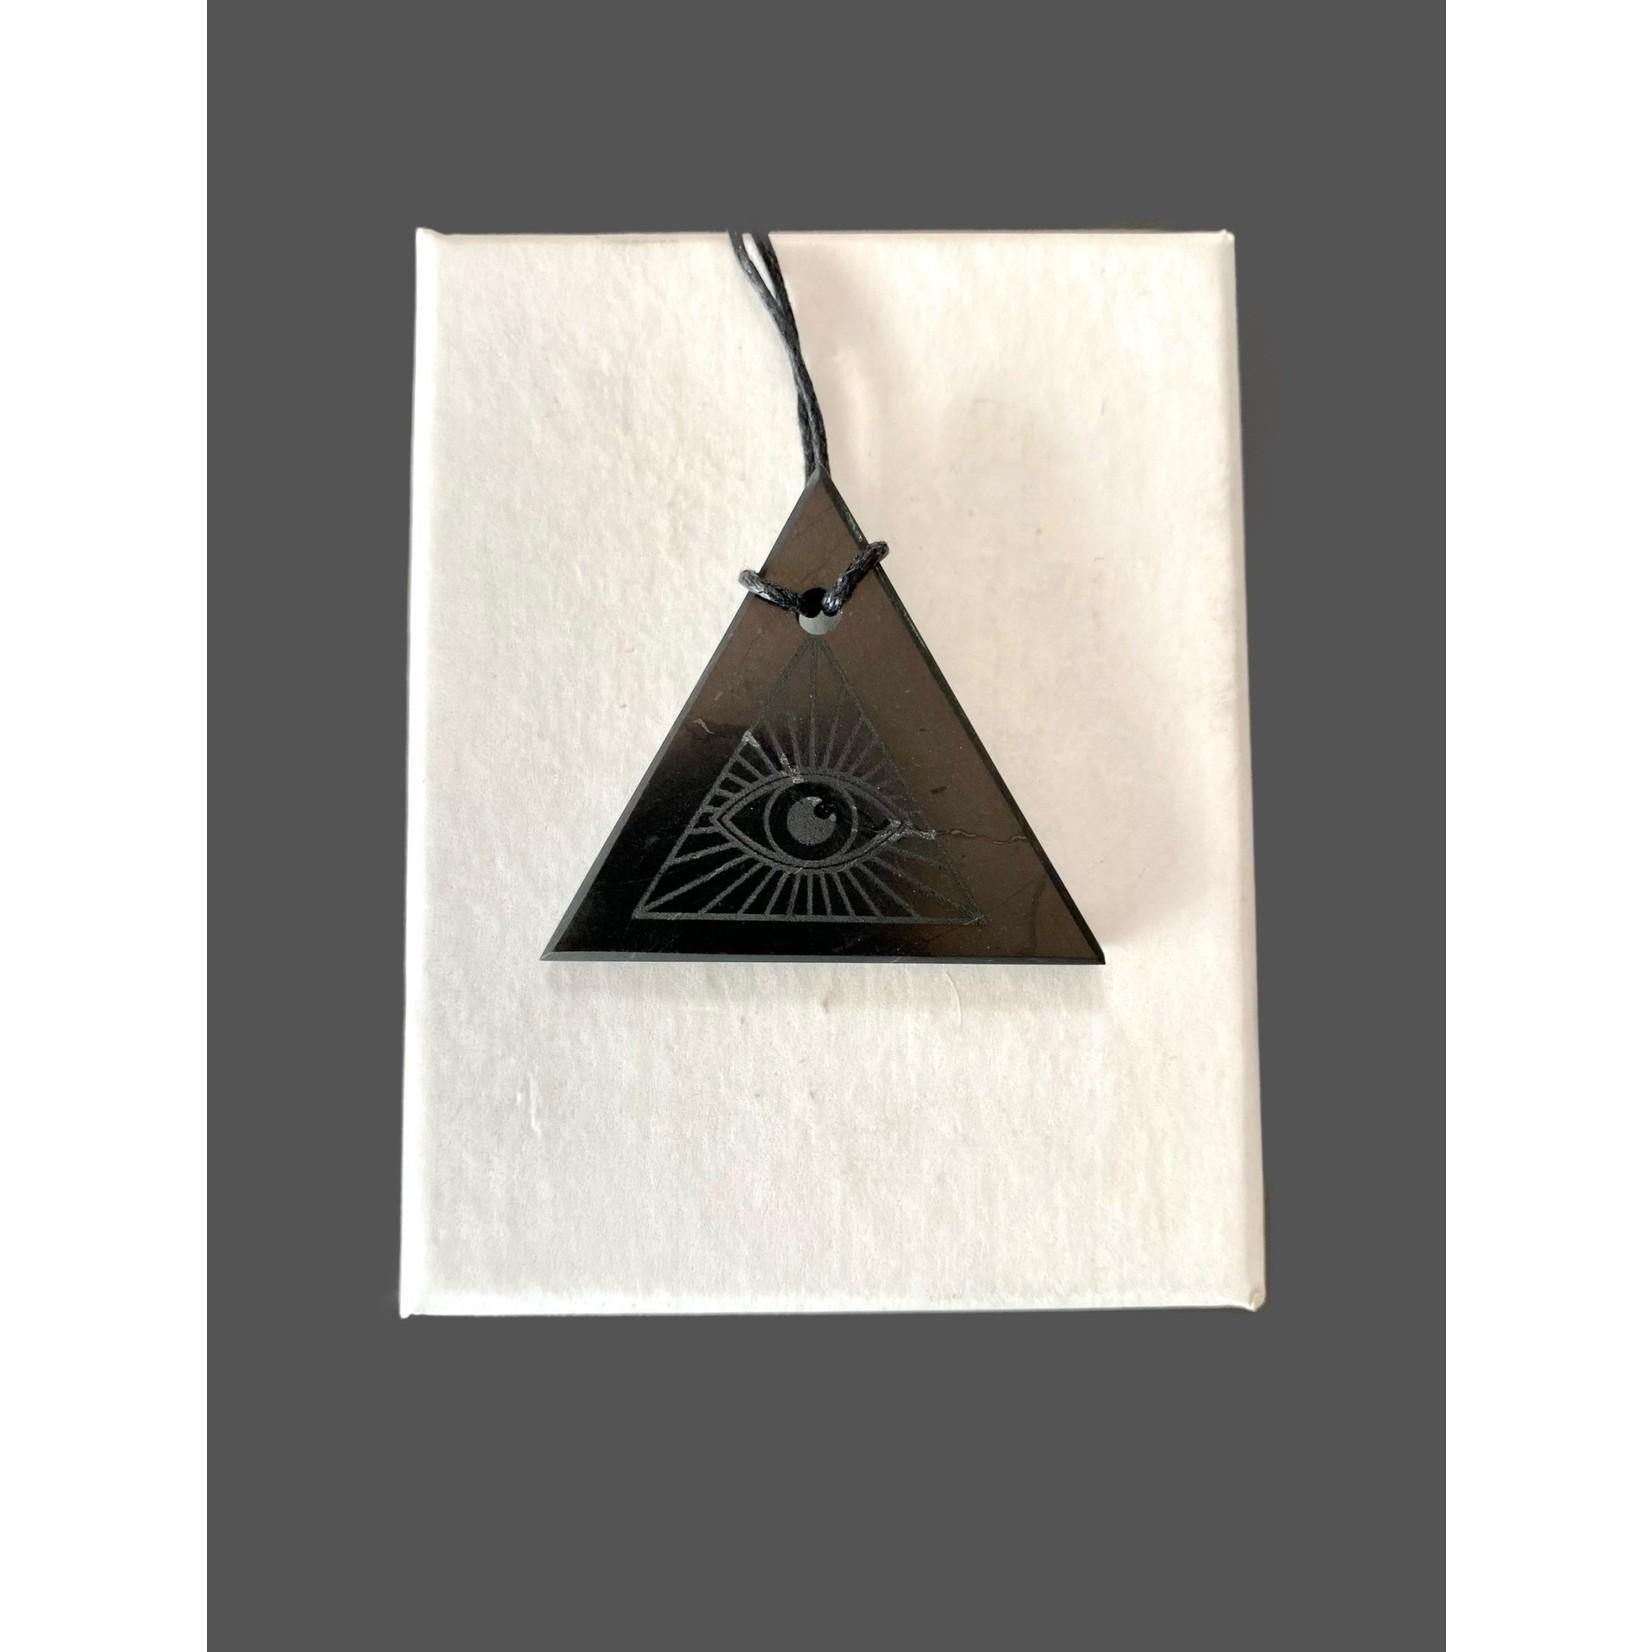 Colgante Shungit triángulo-Ojo Dios